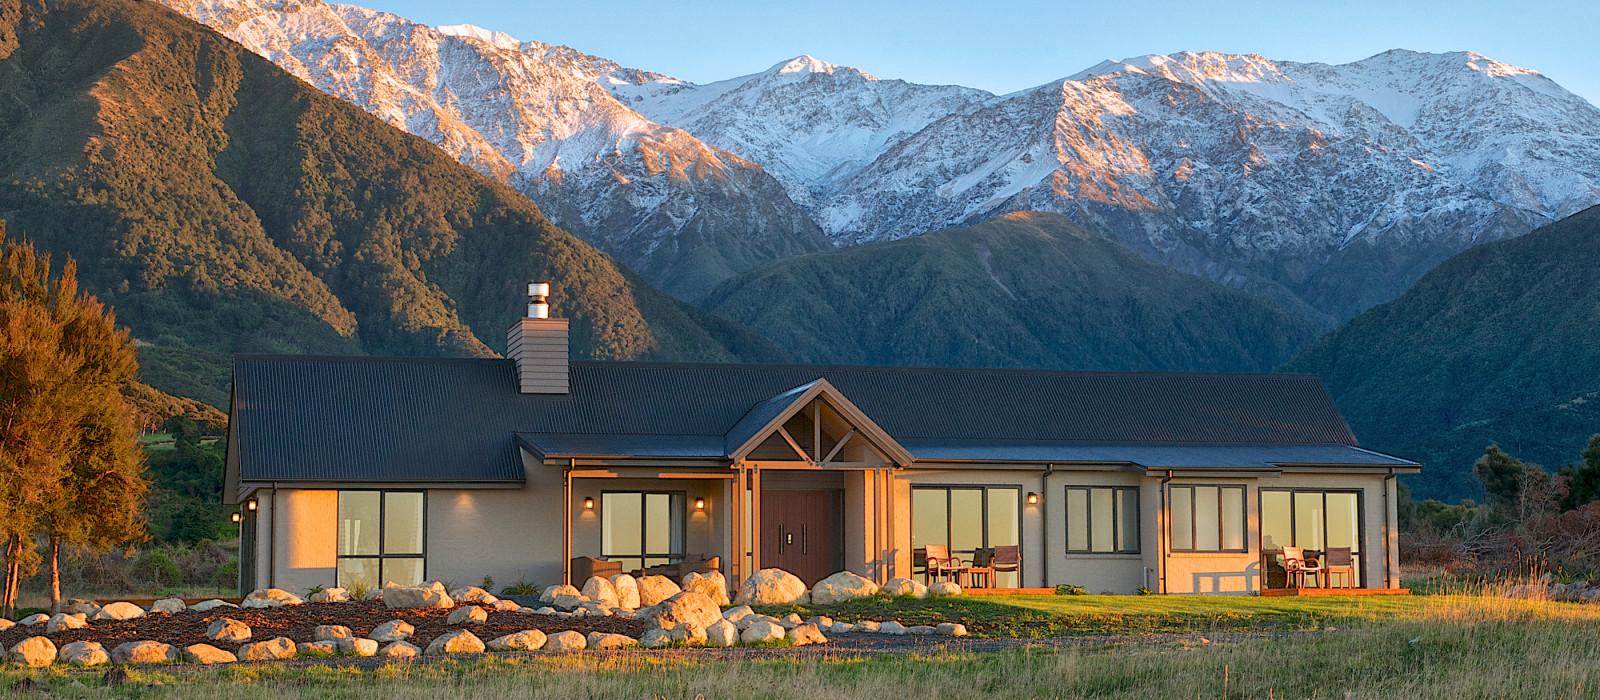 Hotel Manakau Lodge New Zealand